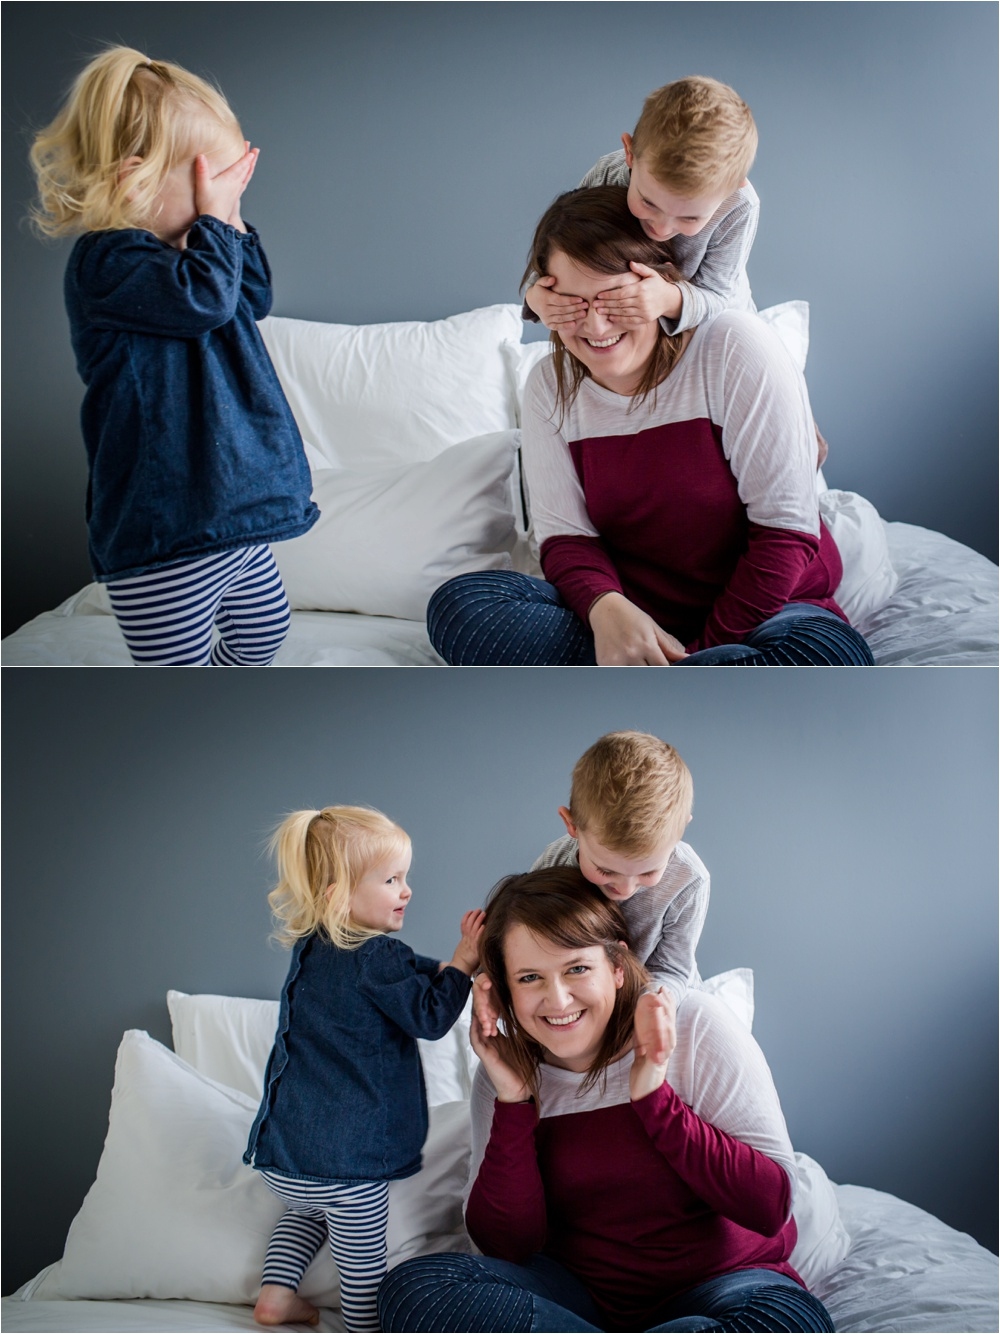 anna todd photography | SYDNEY FAMILY & LIFESTYLE PHOTOGRAPHER